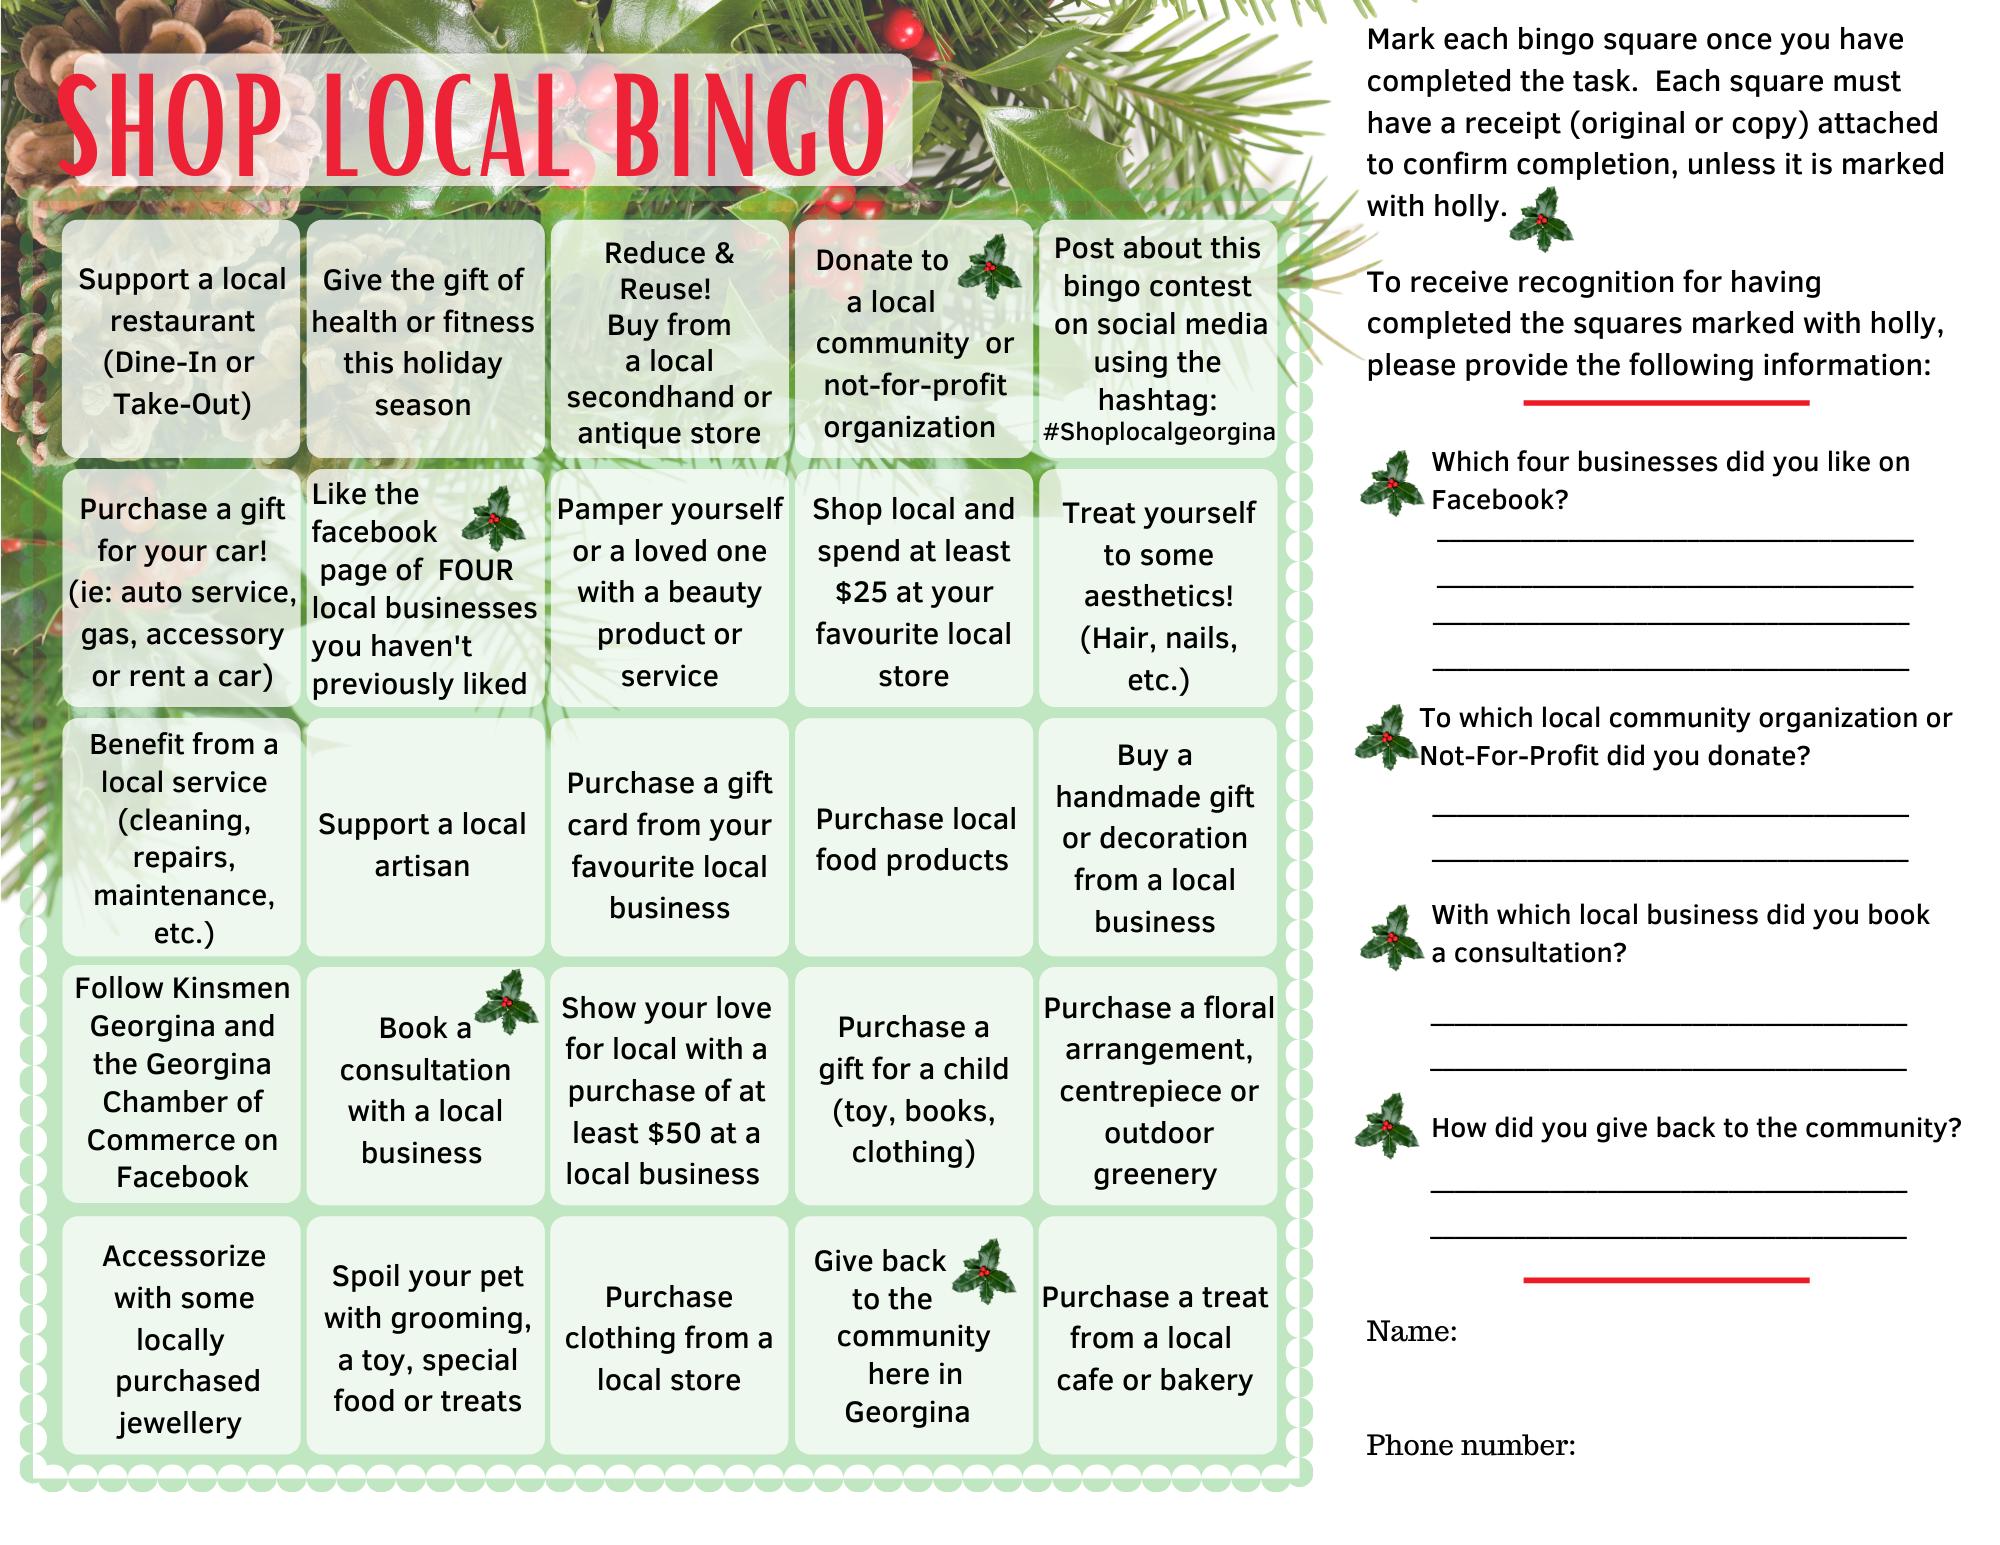 Shop Local Bingo Contest 2/2